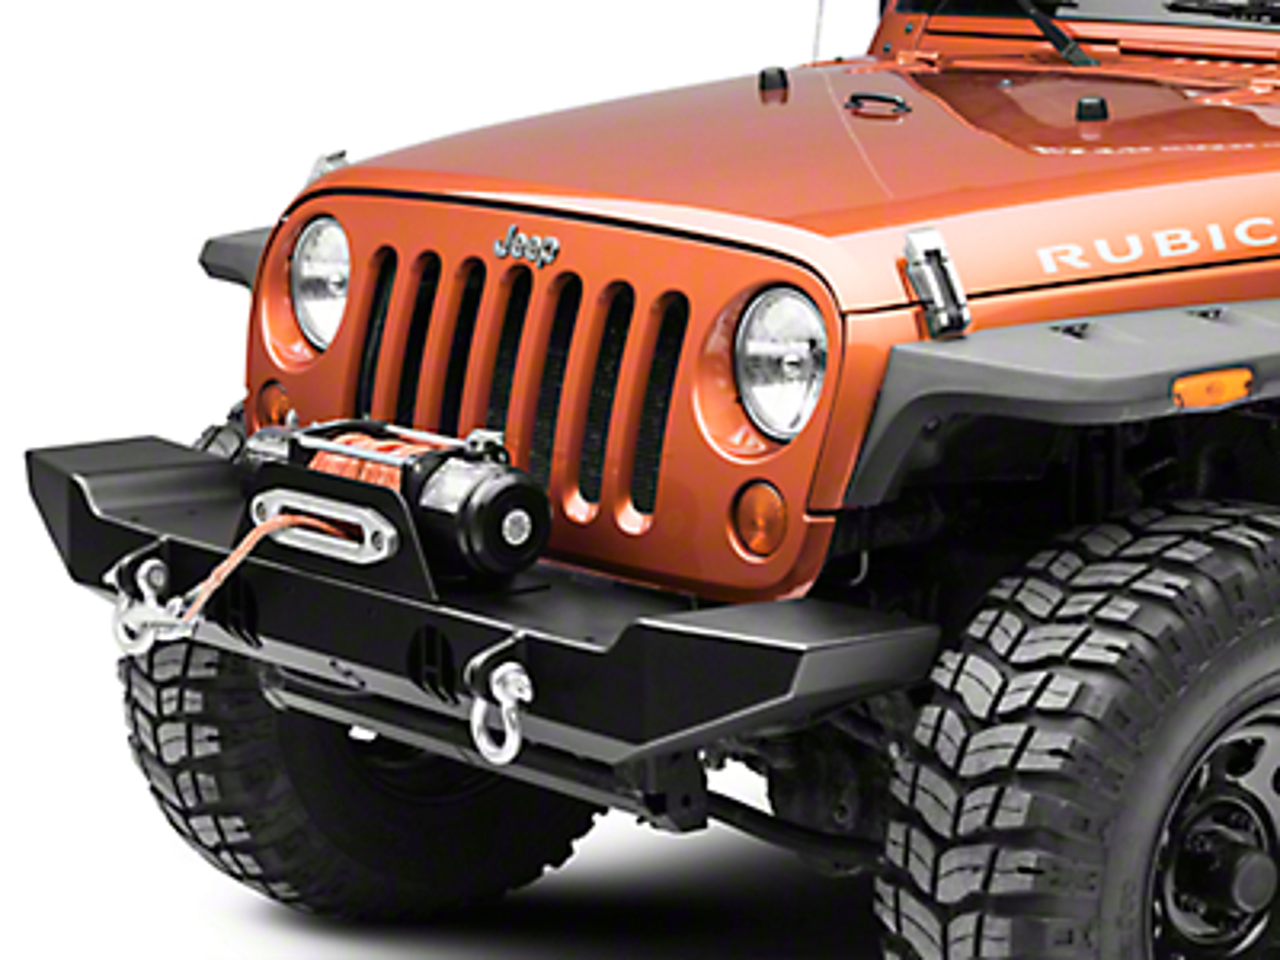 Hyline Offroad Standard Front Bumper Assembly (07-18 Jeep Wrangler JK)